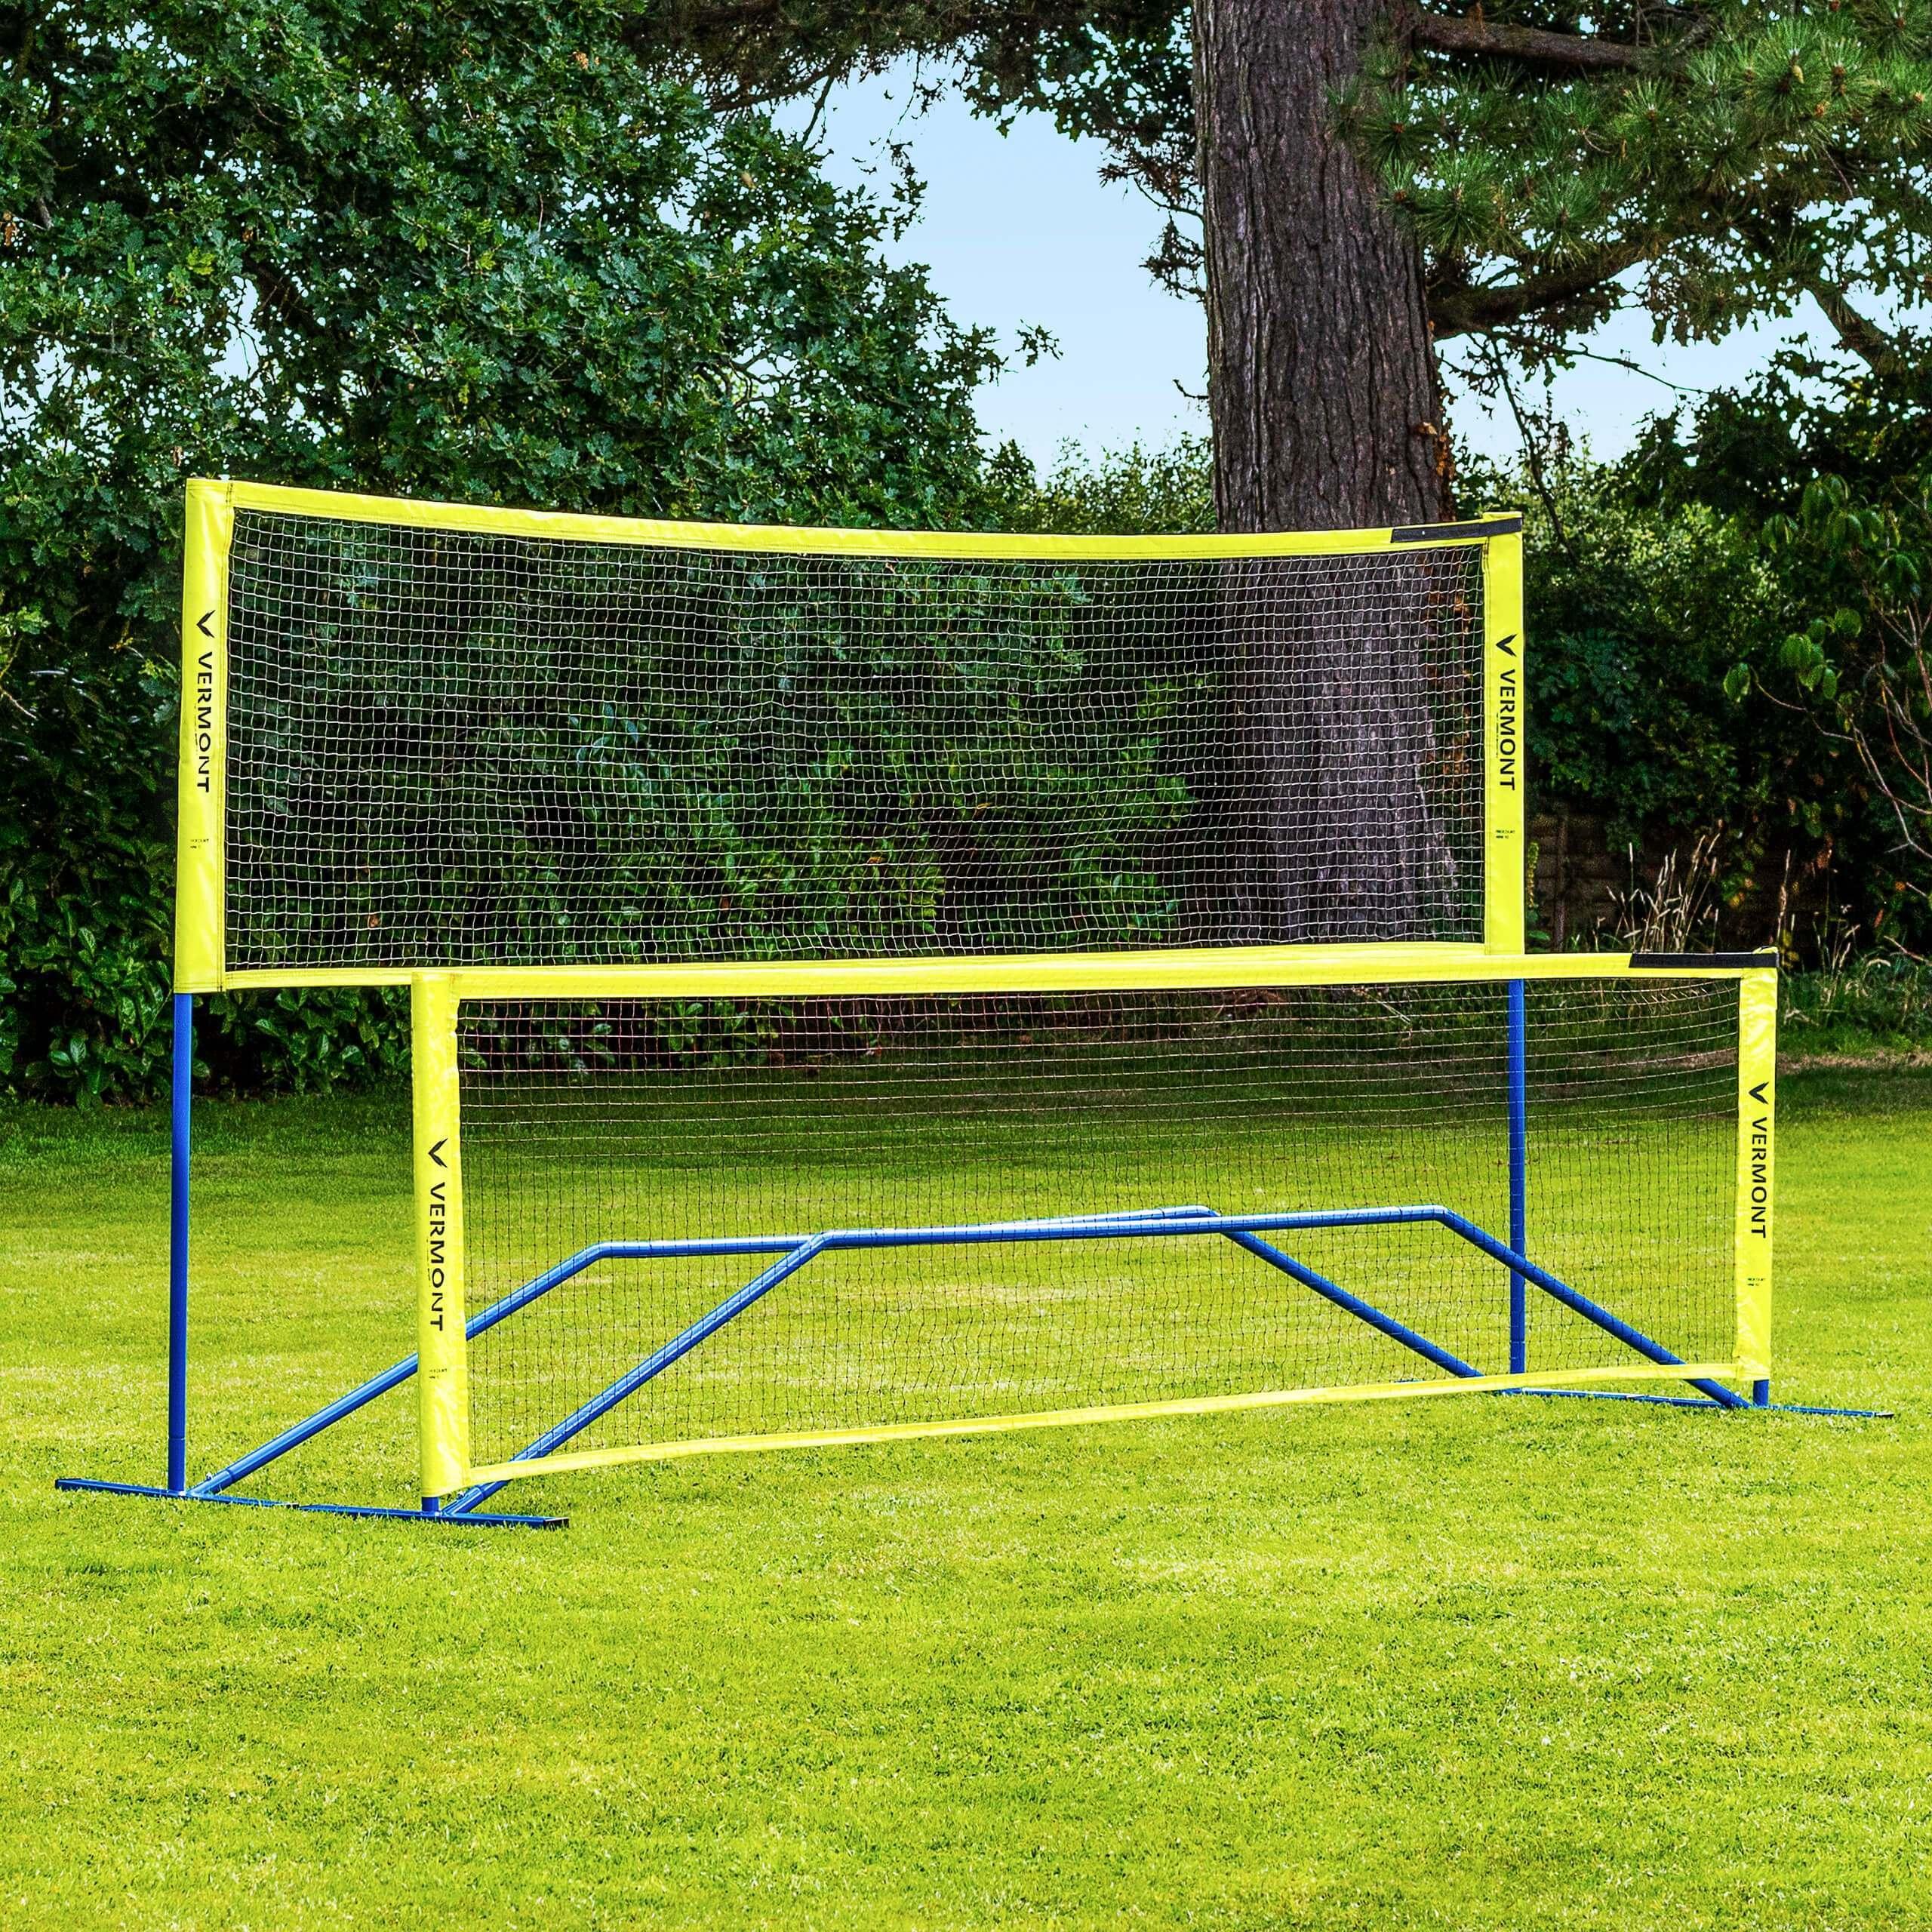 Vermont ProCourt Minitennis & badminton combinät [3m]